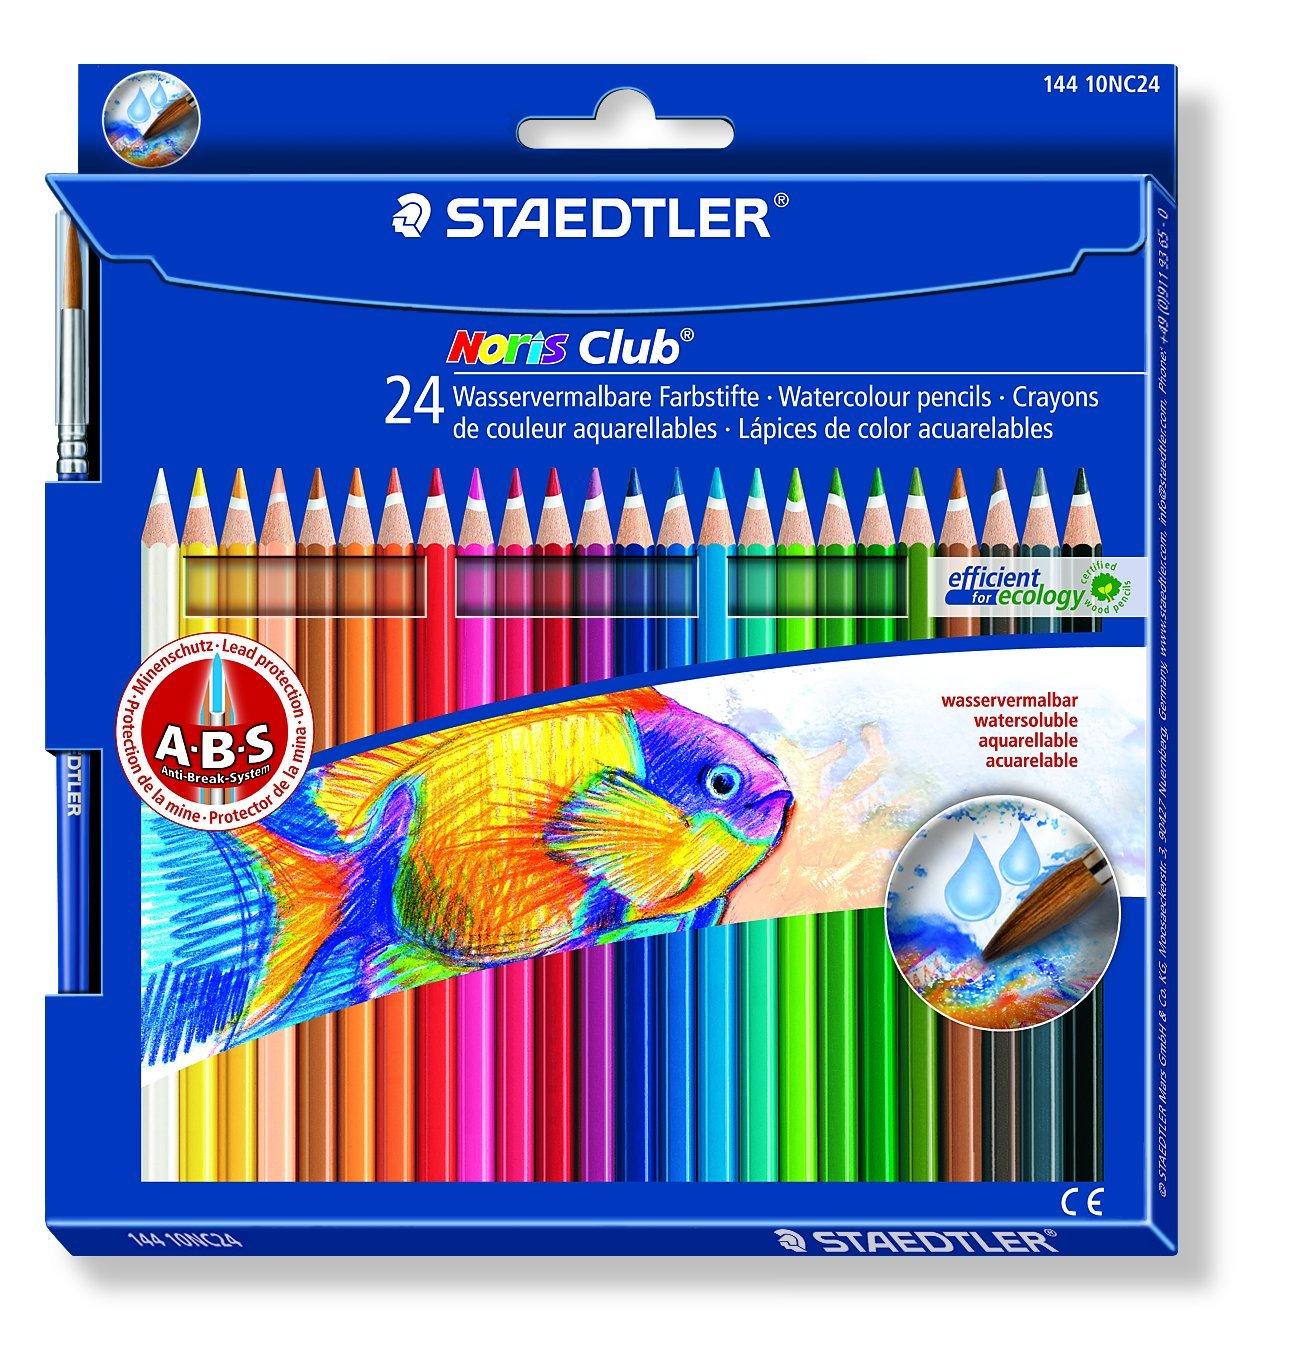 STAEDTLER 144 10NC24 - Estuche con 24 lápices